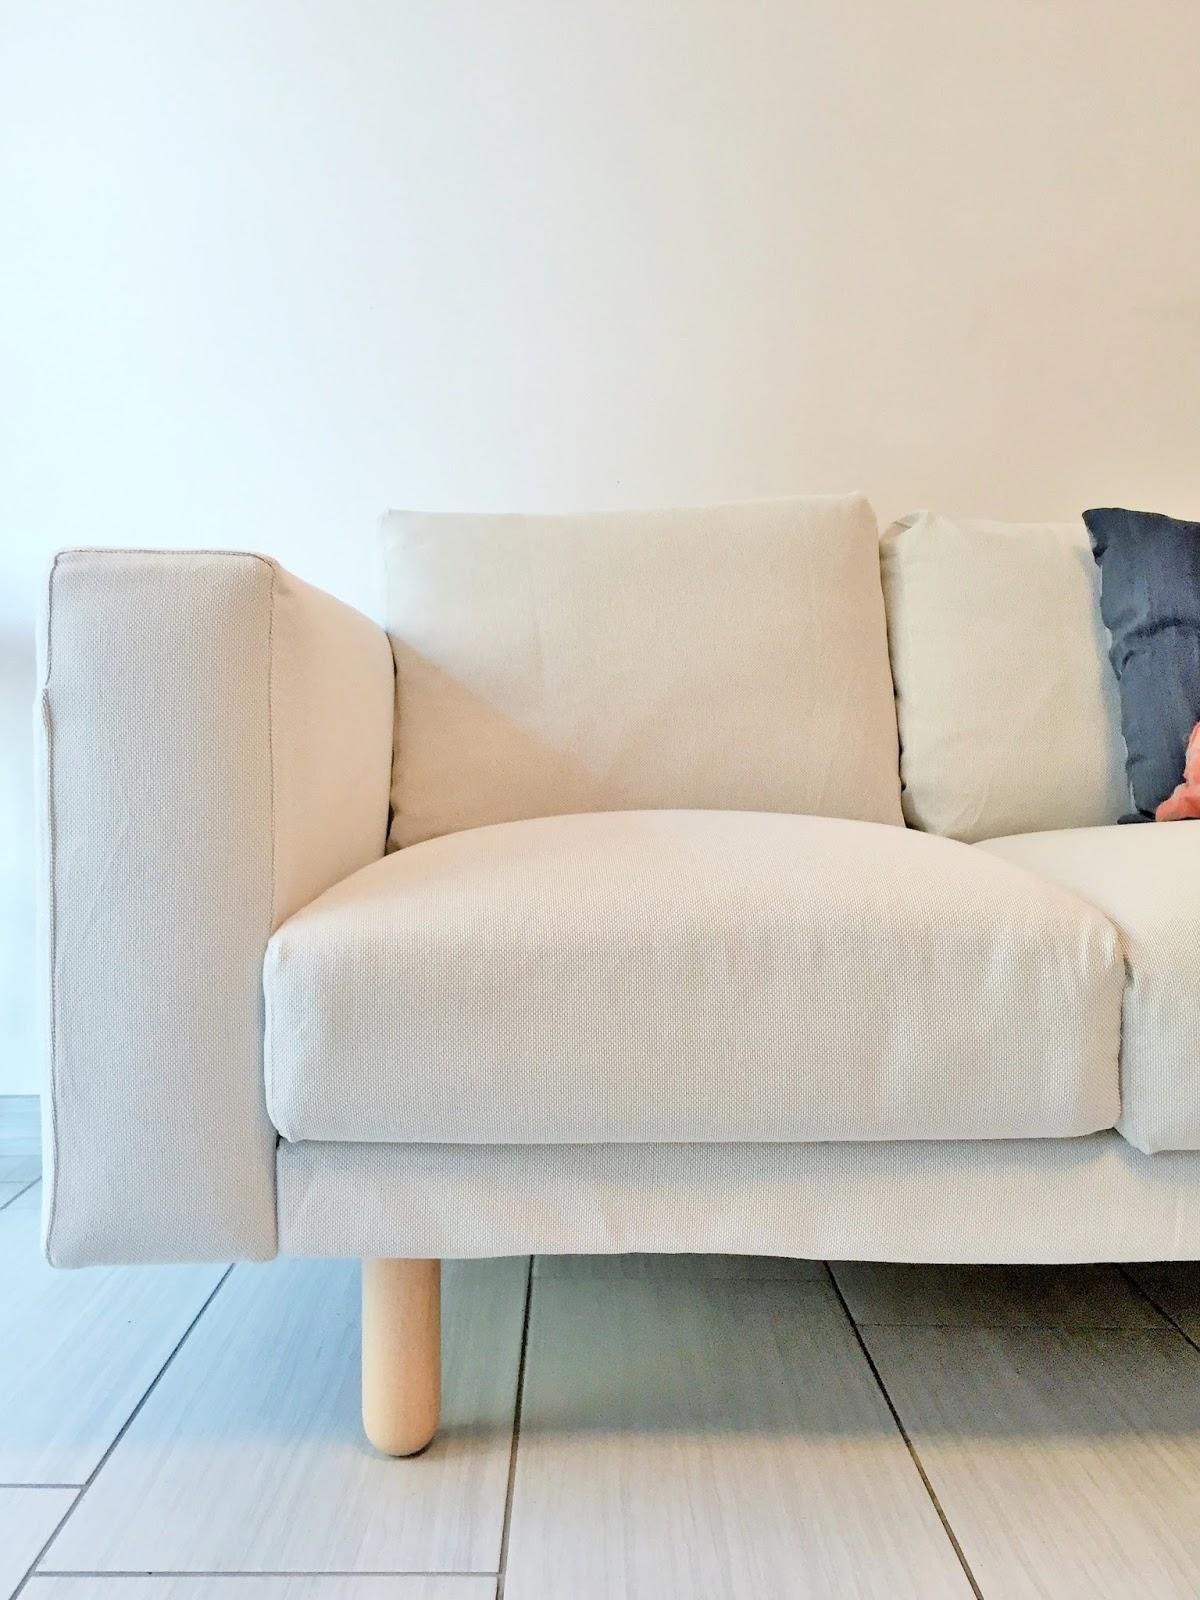 Divani blog arredamento - Ikea cuscini divano ...